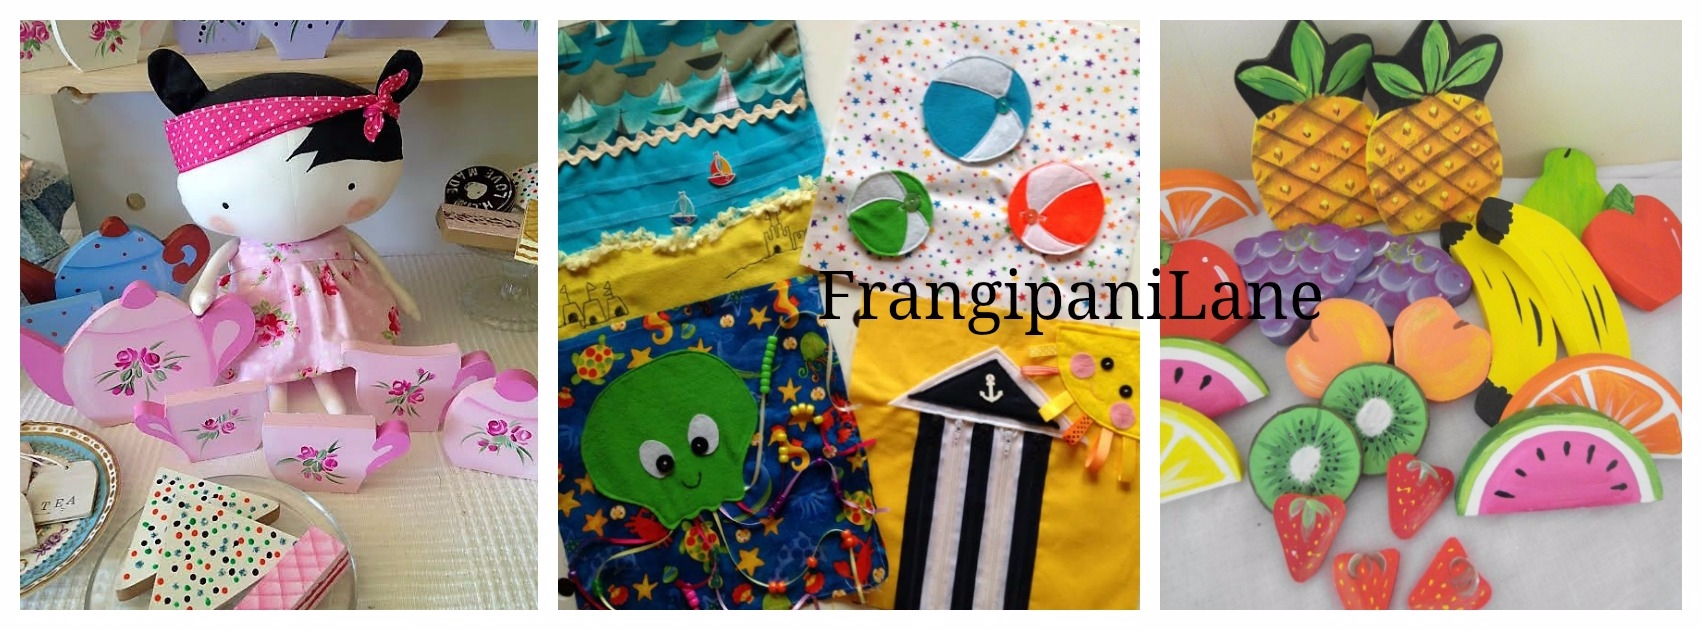 FrangipaniLane (@frangipanilane) Cover Image